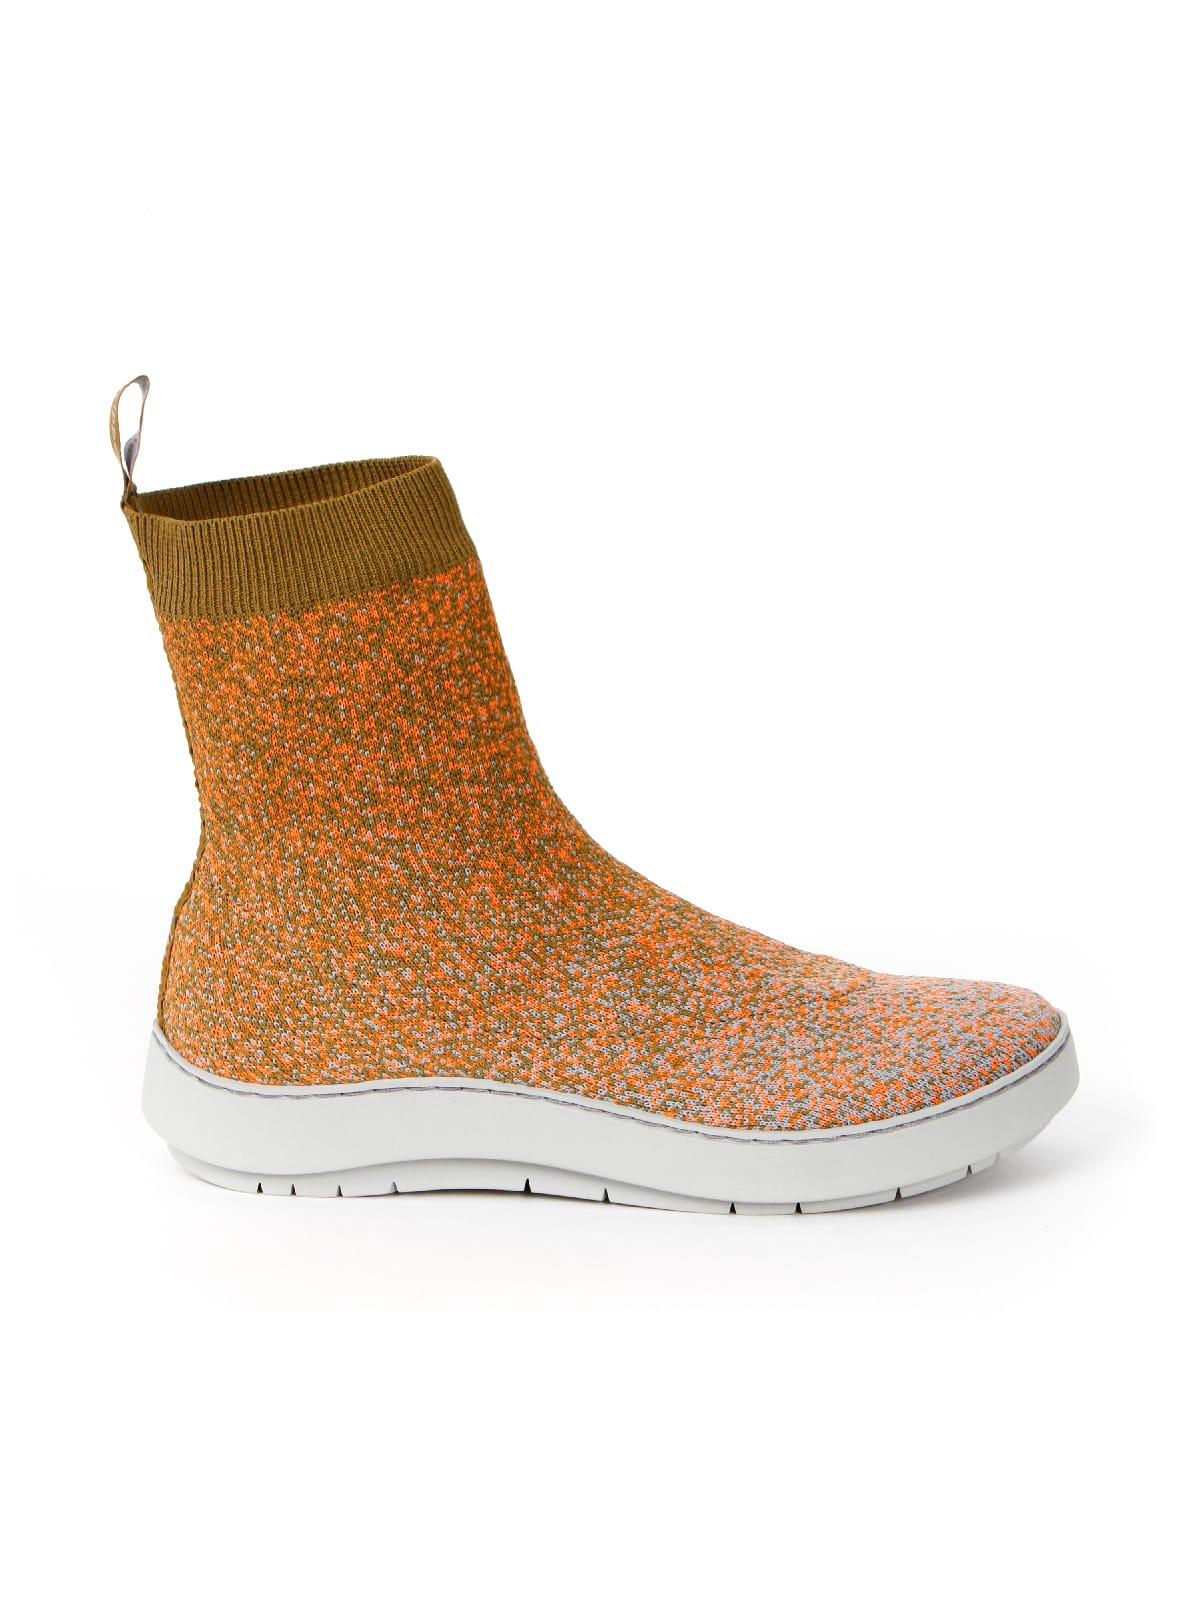 3D knitted sockboot Sparkle papaya rechts